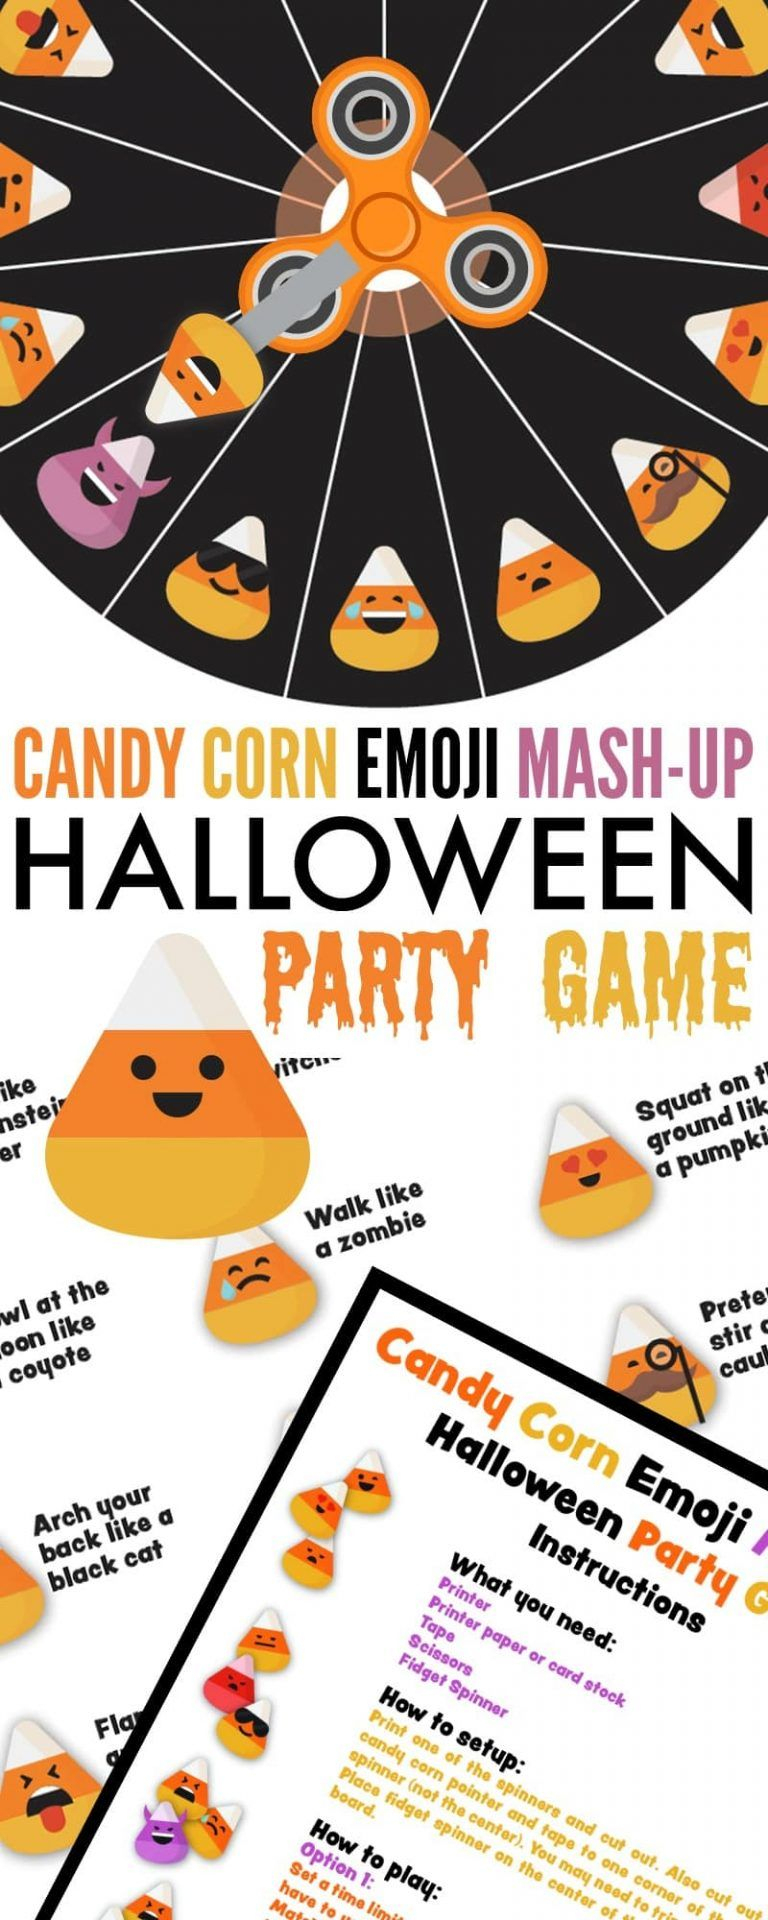 Candy Corn Emoji Mash-Up Halloween Party Game | School | Halloween - Free Printable Halloween Party Games